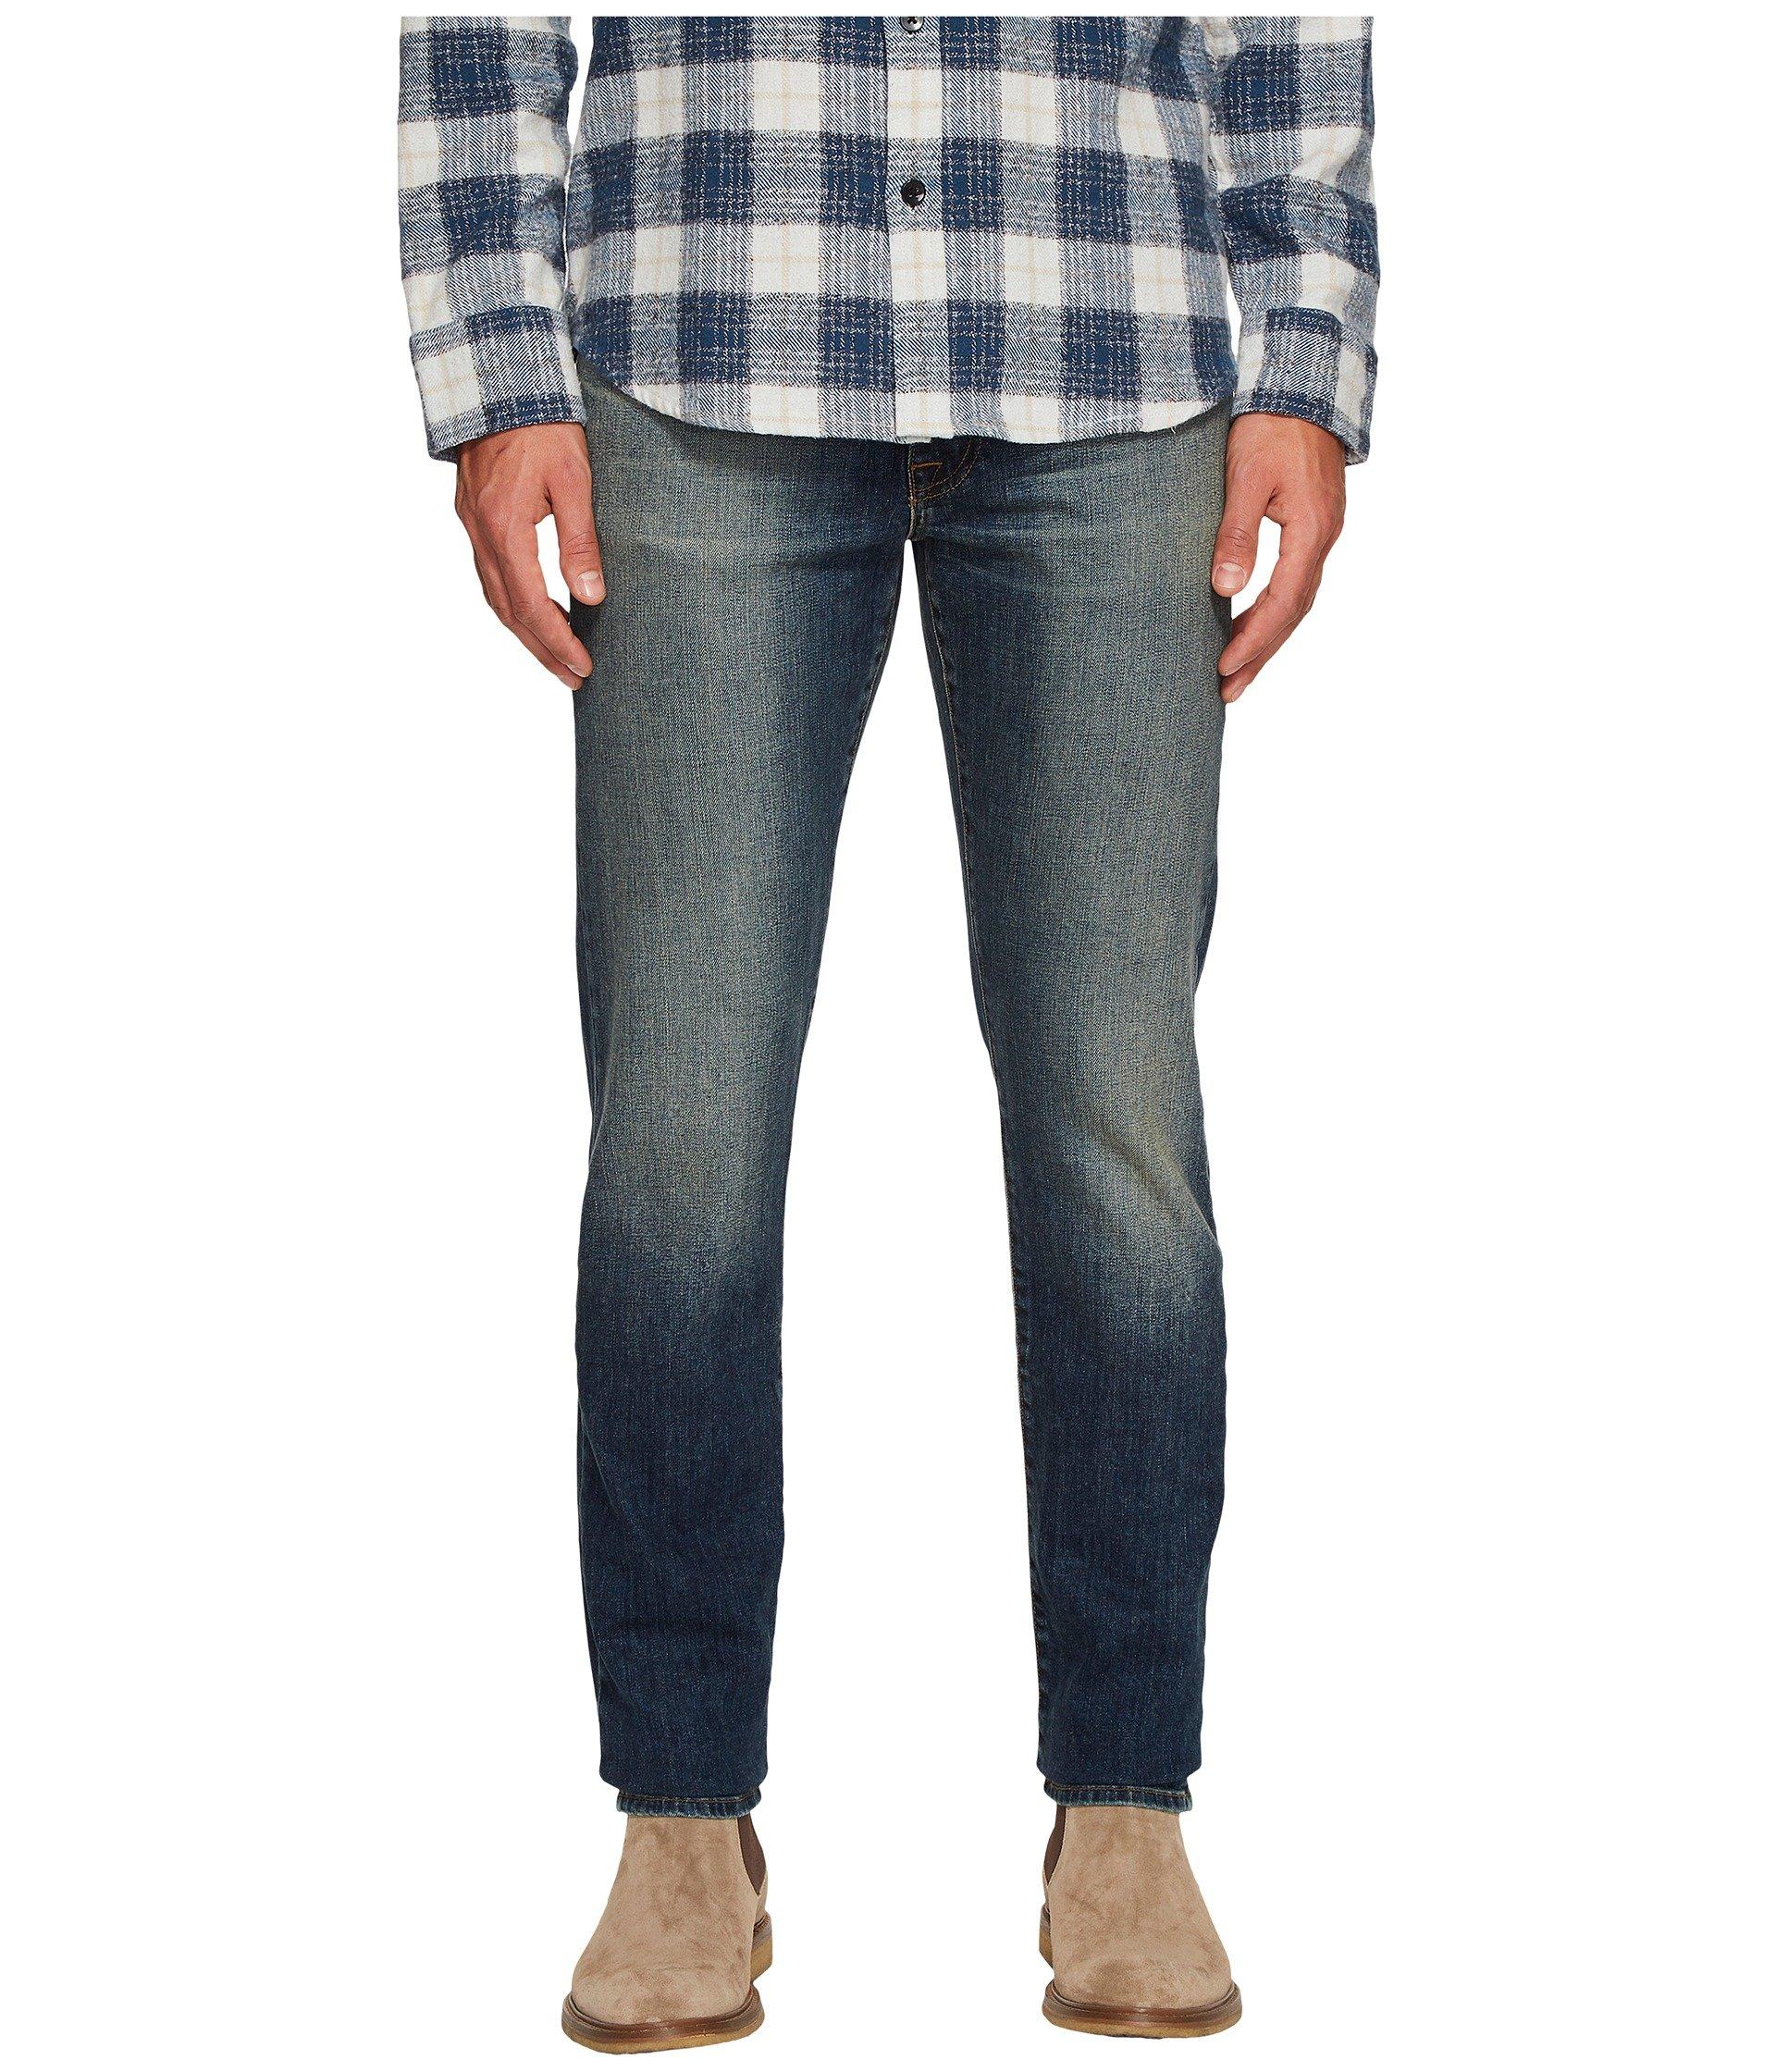 BALDWIN 76 Jeans, Benson